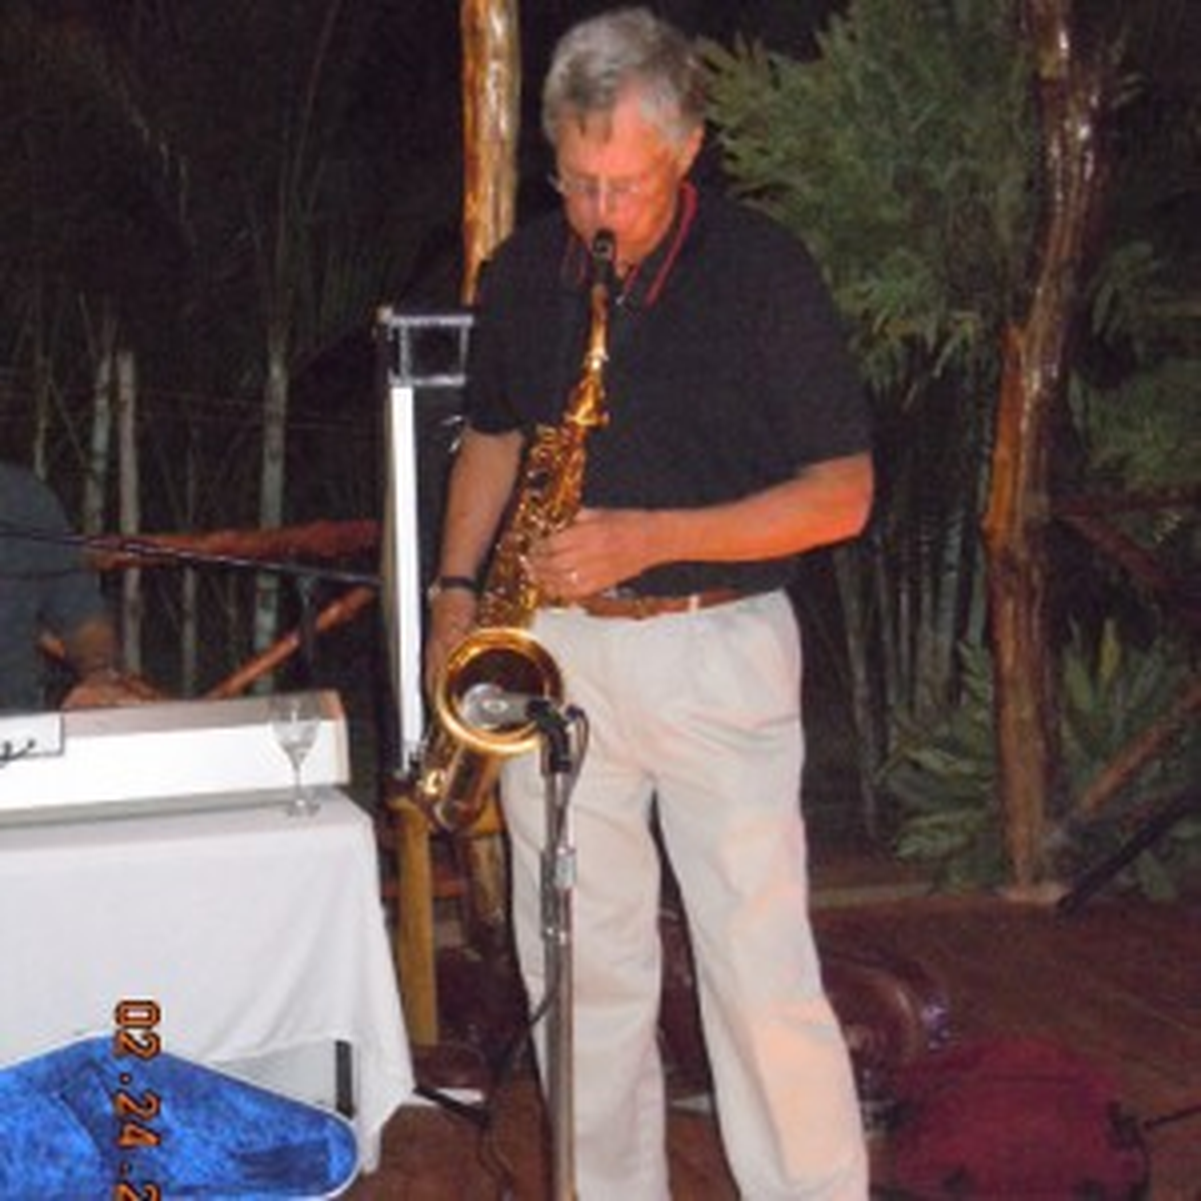 Jazz, Standards, old time rock, soul, blues, big band